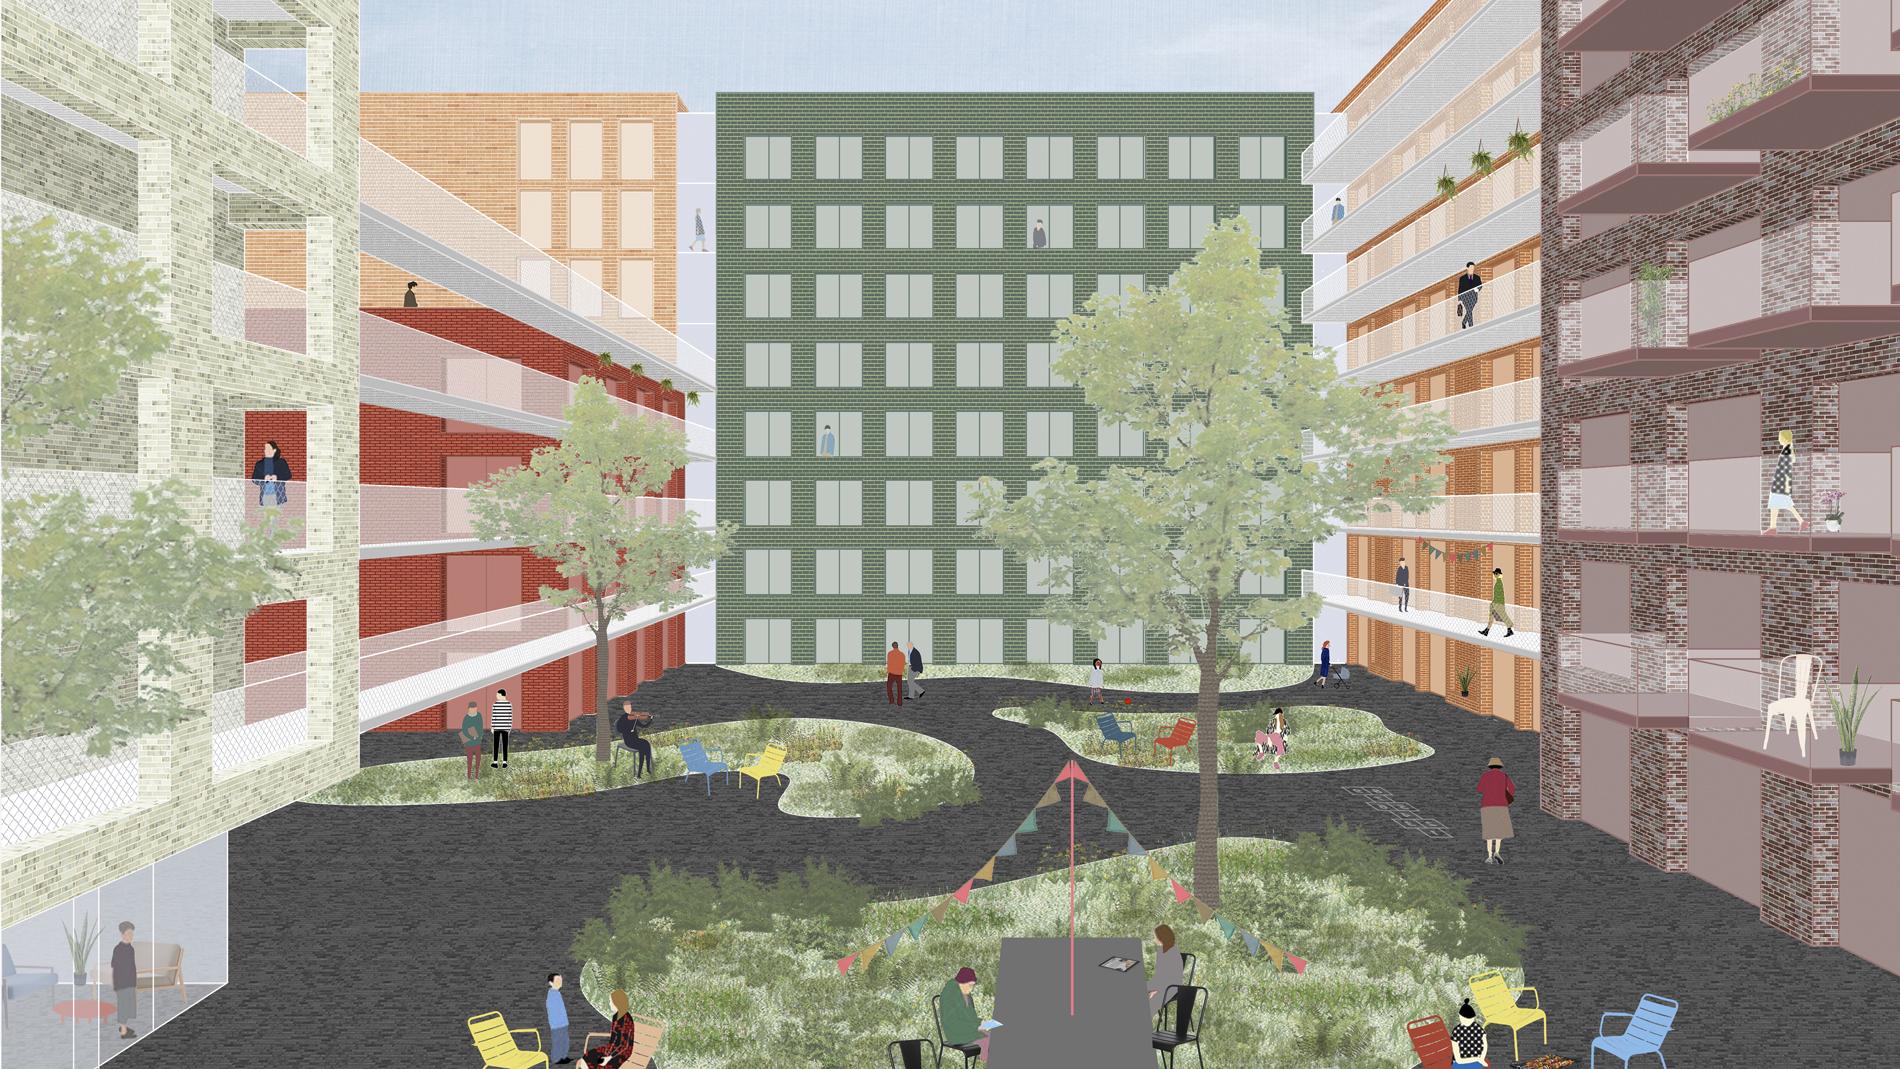 Bureau of architecture and urbanism: the matchbox house architect